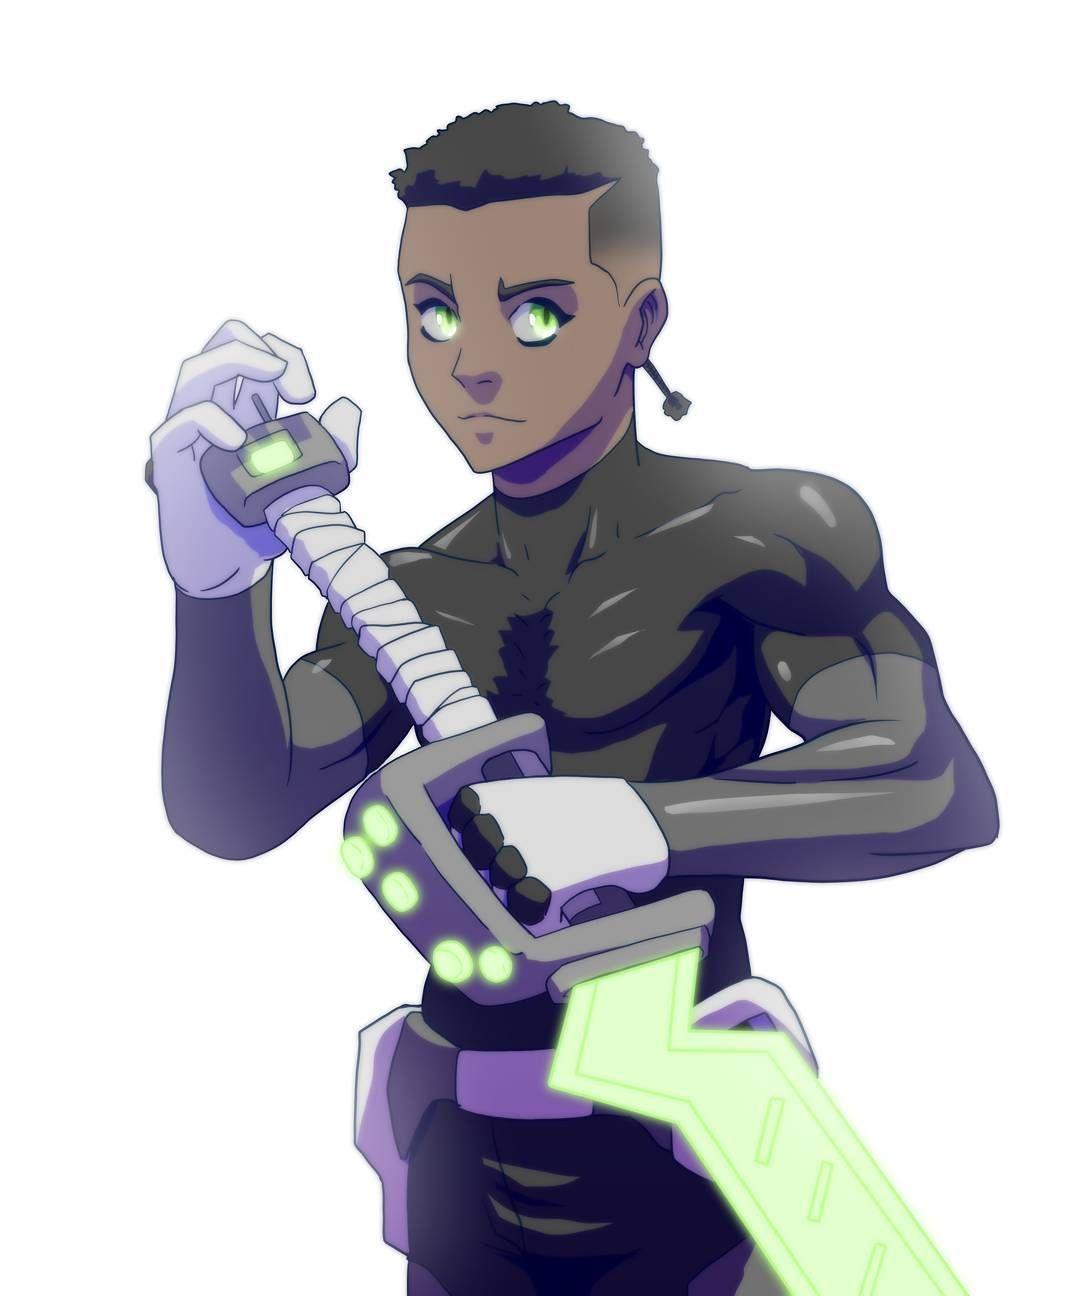 anime characters dark skin manga dope character female instagram animedrawing comics toney artwork superhero afro guy visit mclaughlin aaron skins